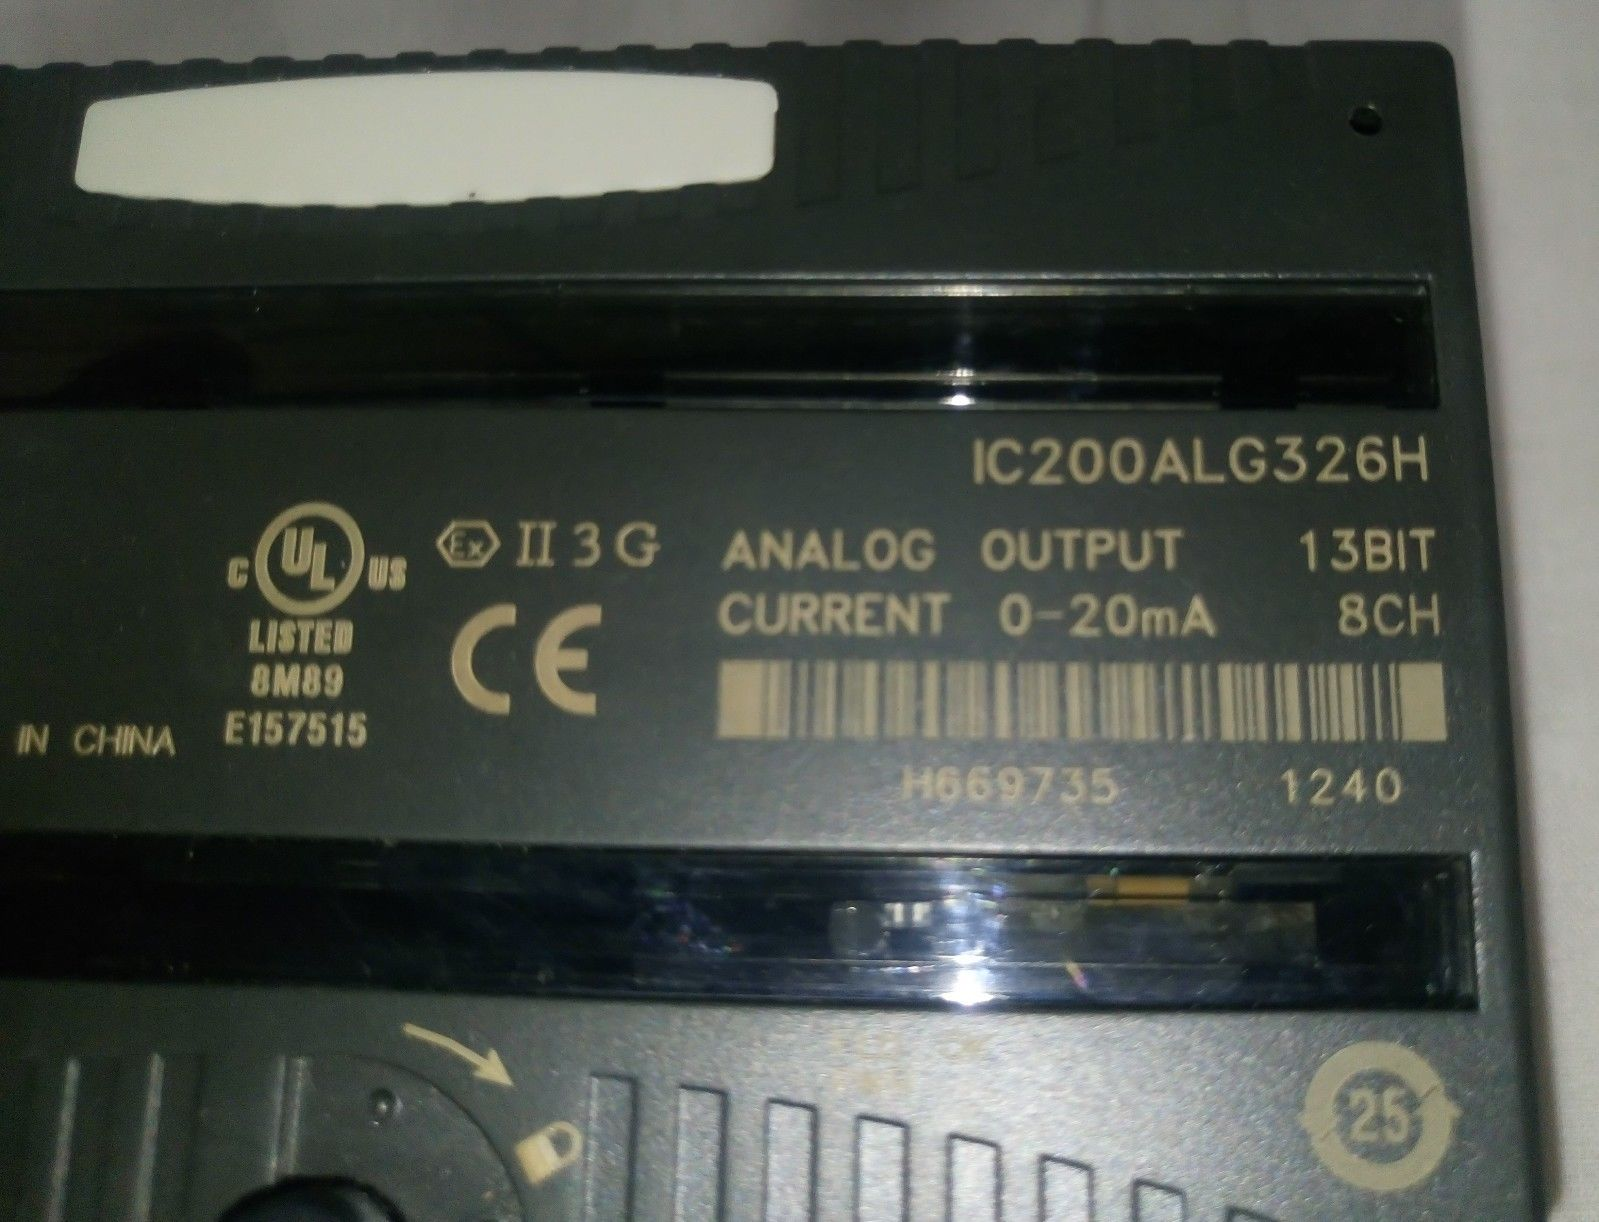 Cung cấp Analog Output Module IC200ALG326 hãng GE-FANUC